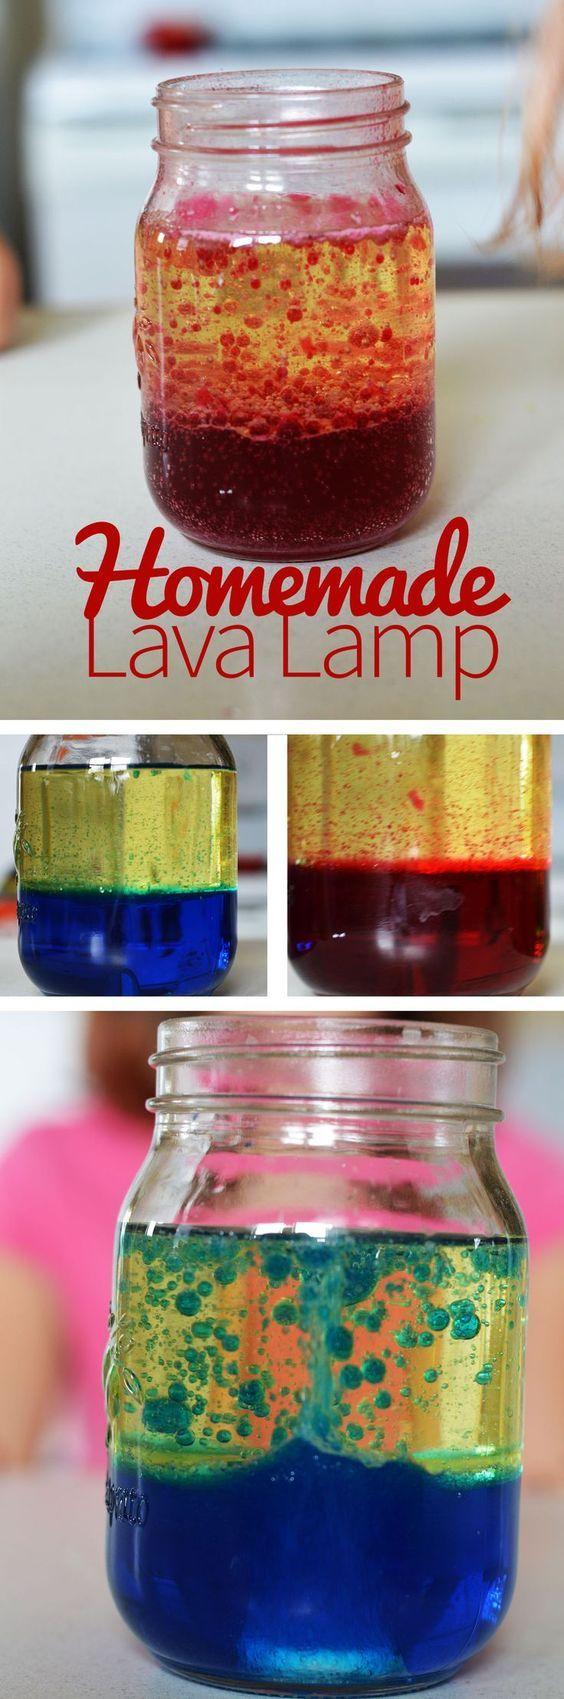 Lava lamp overnight - Homemade Lava Lamp